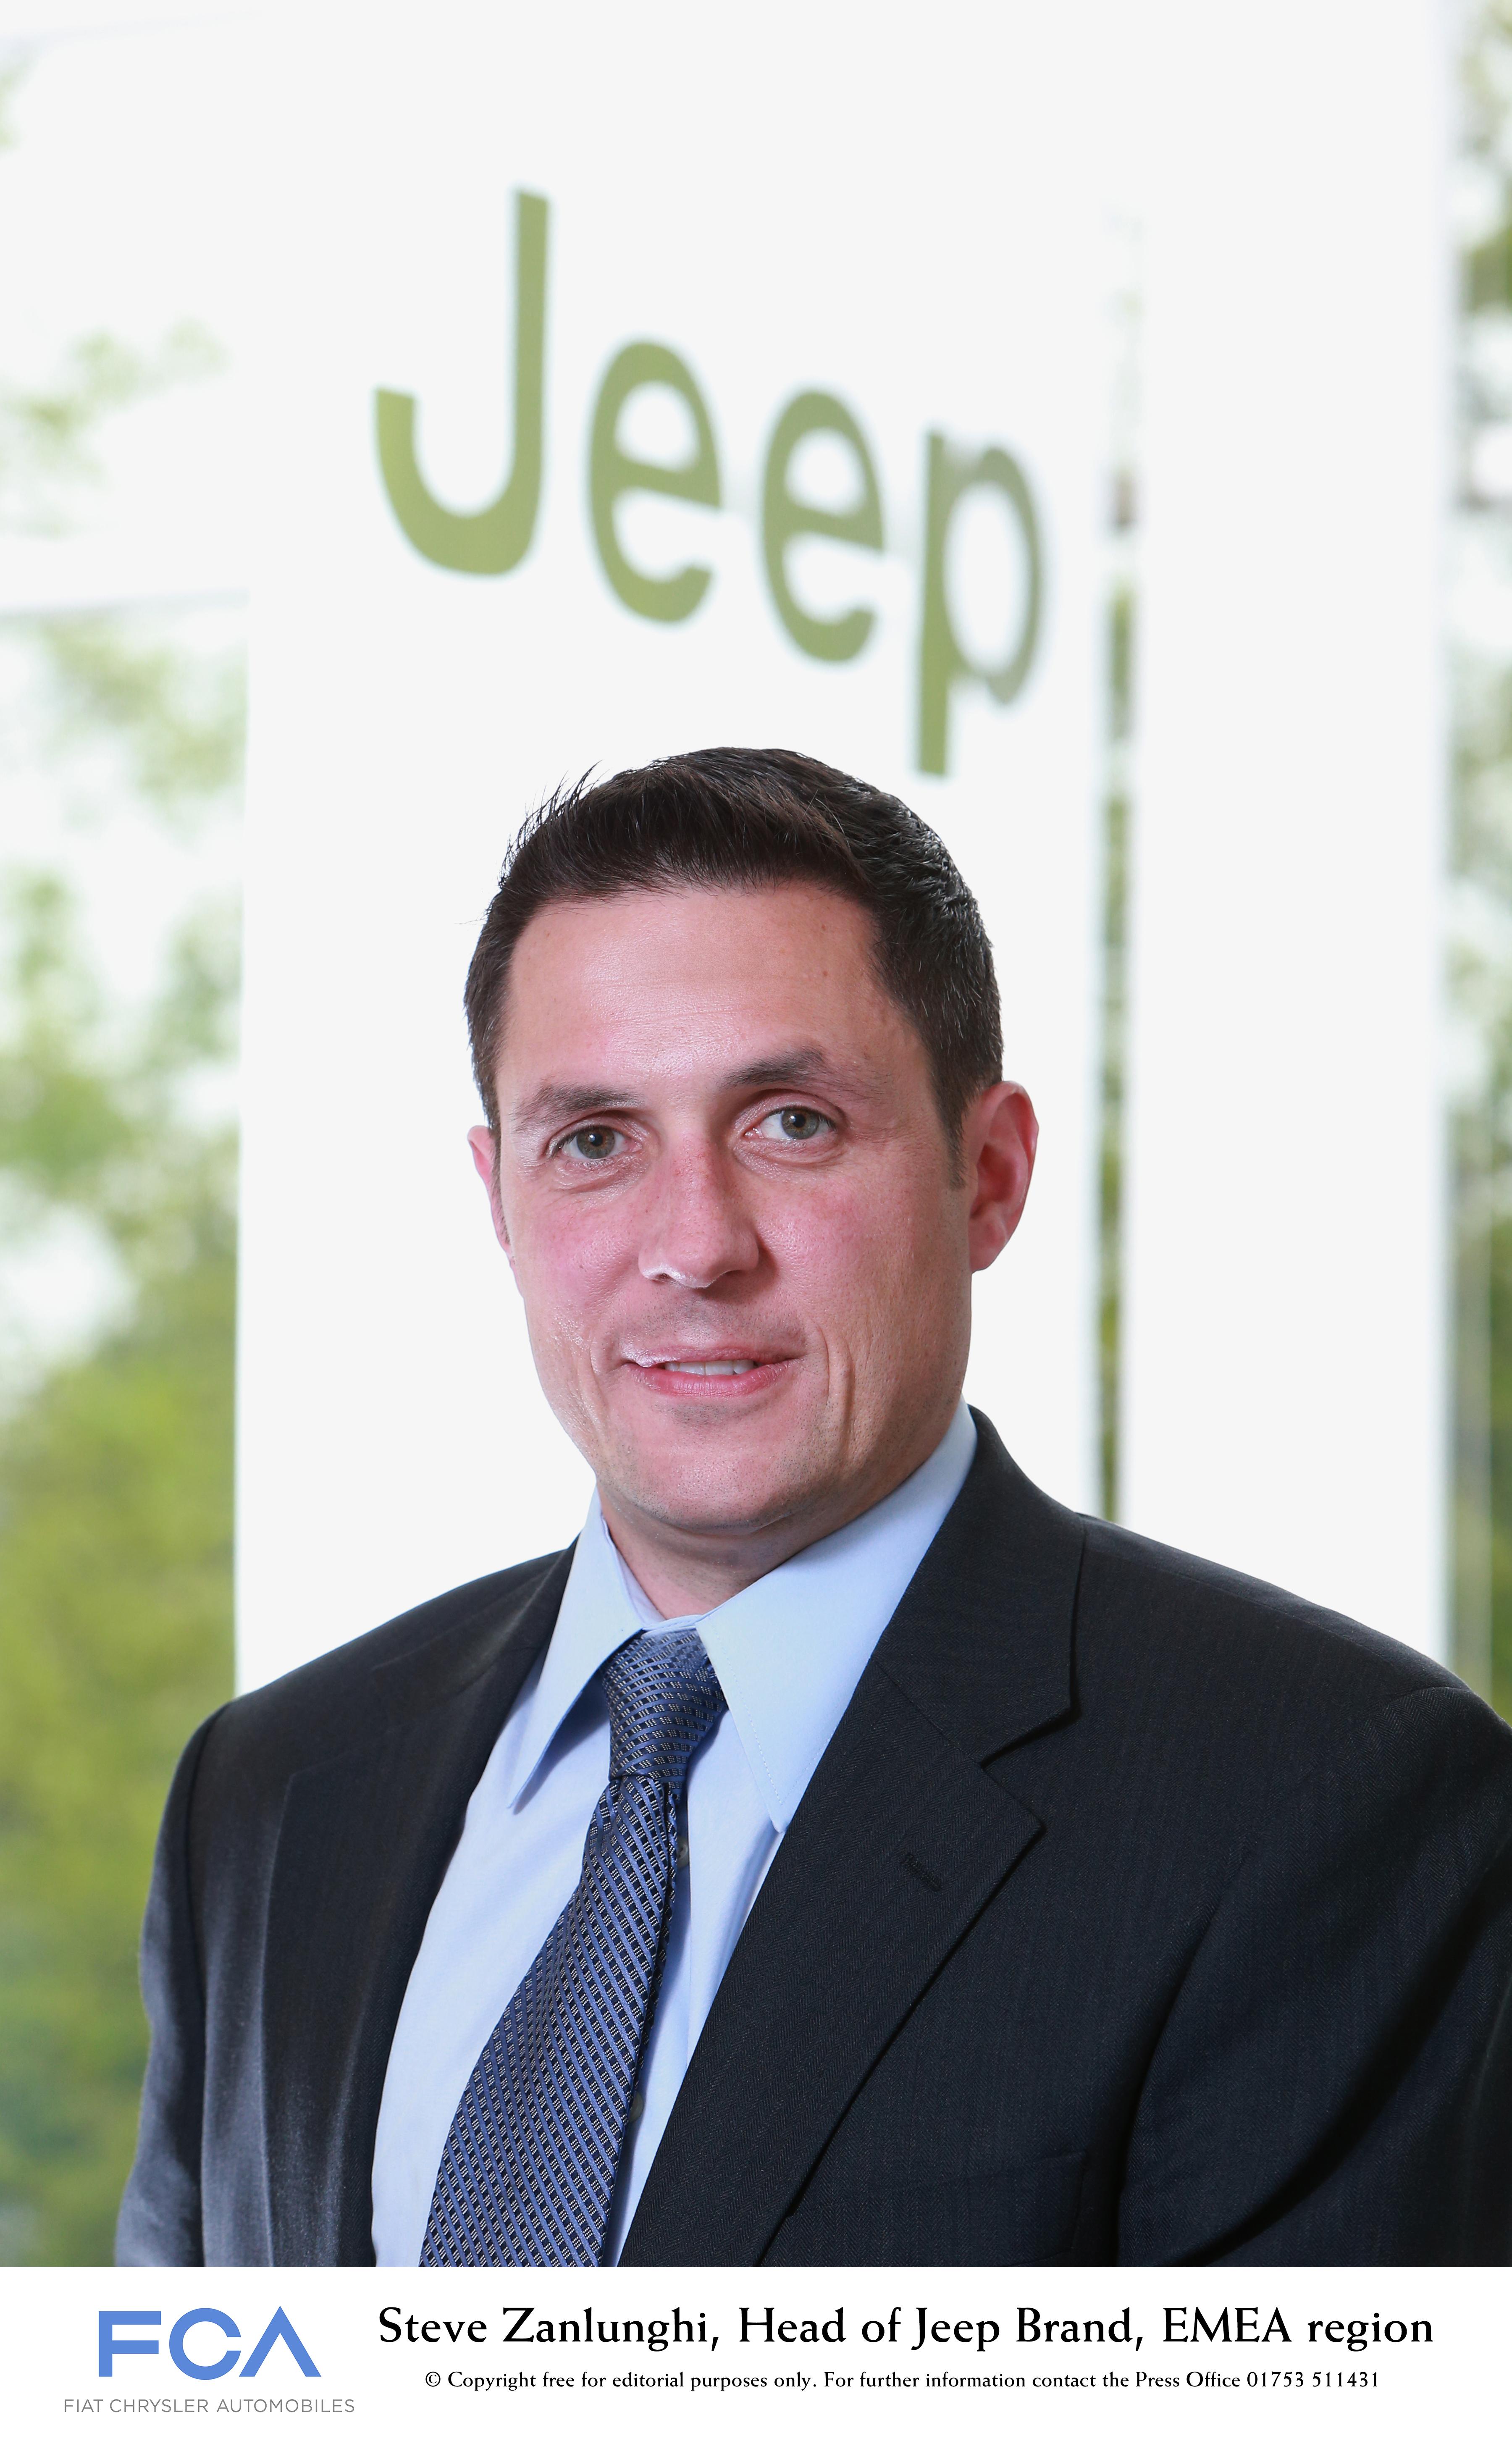 Steve Zanlunghi Appointed Head Of Jeep Brand Emea Region